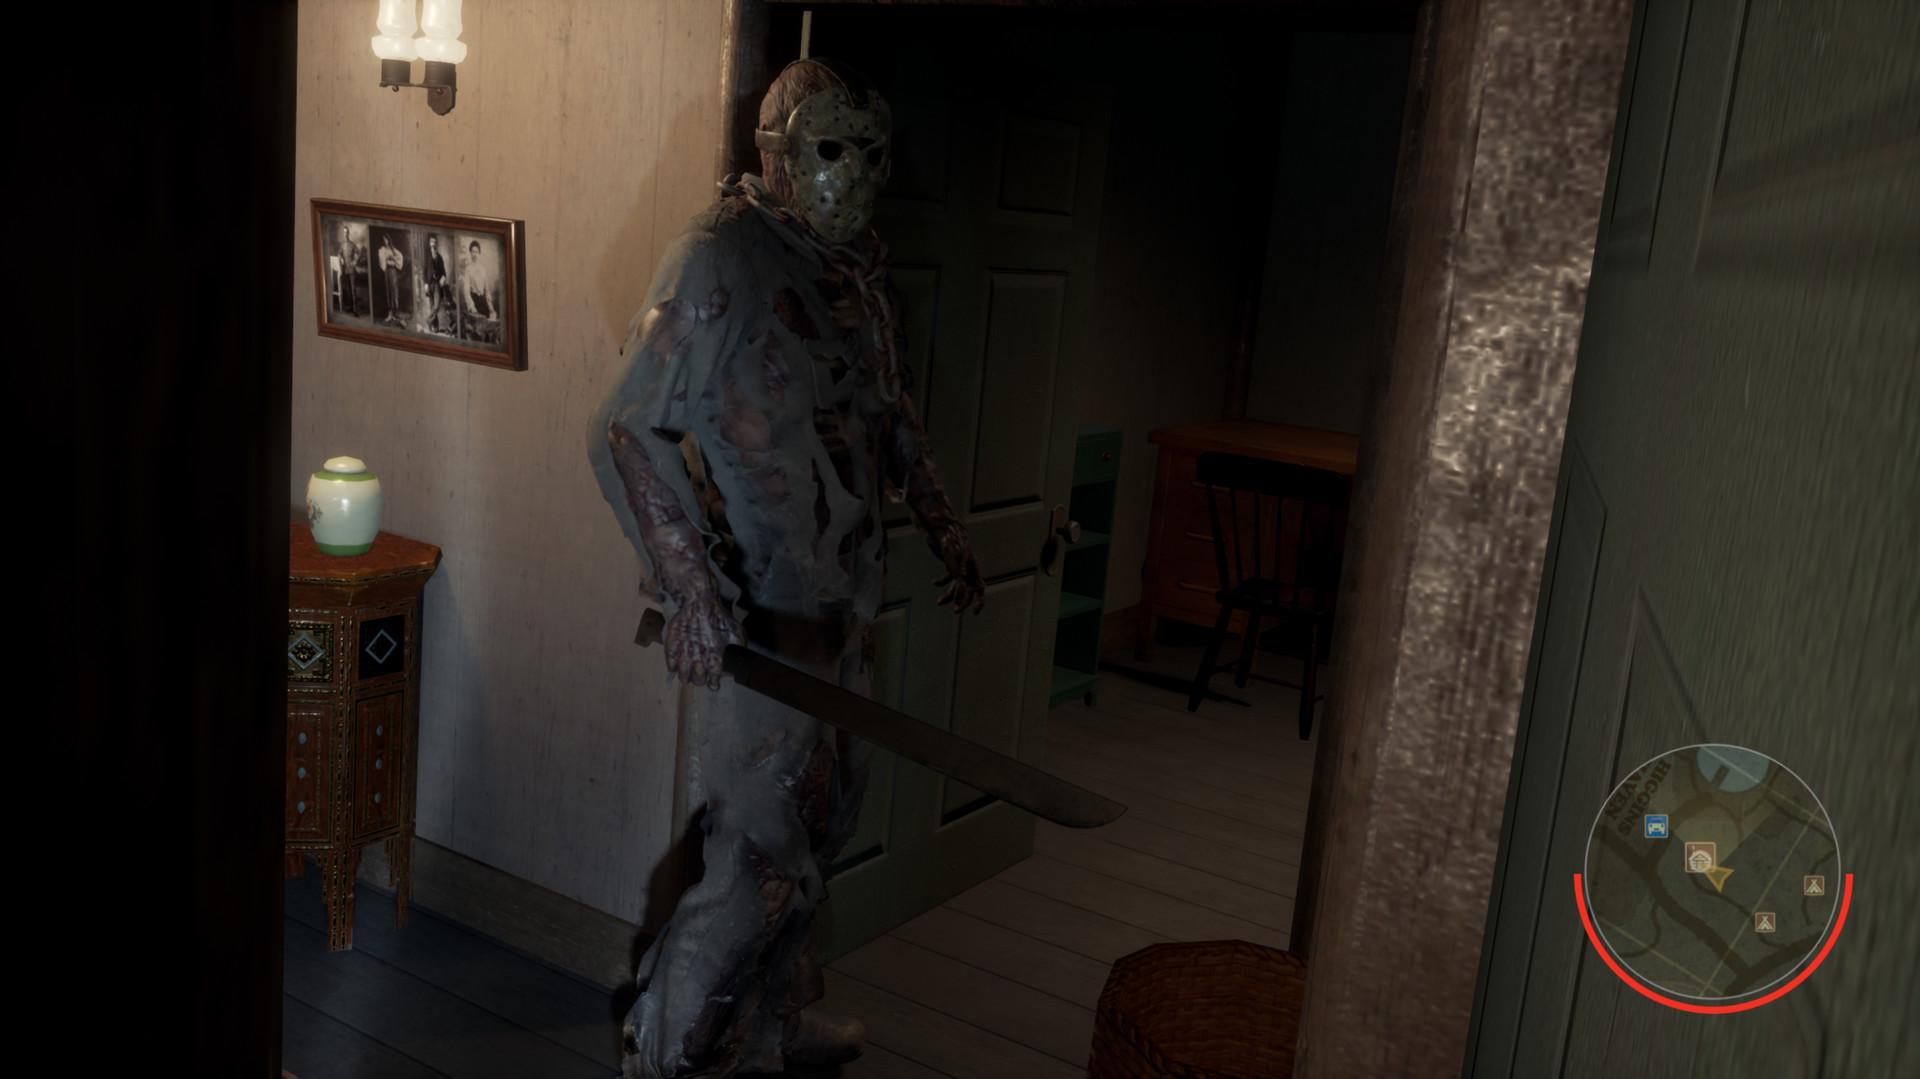 KHAiHOM.com - Friday the 13th: The Game